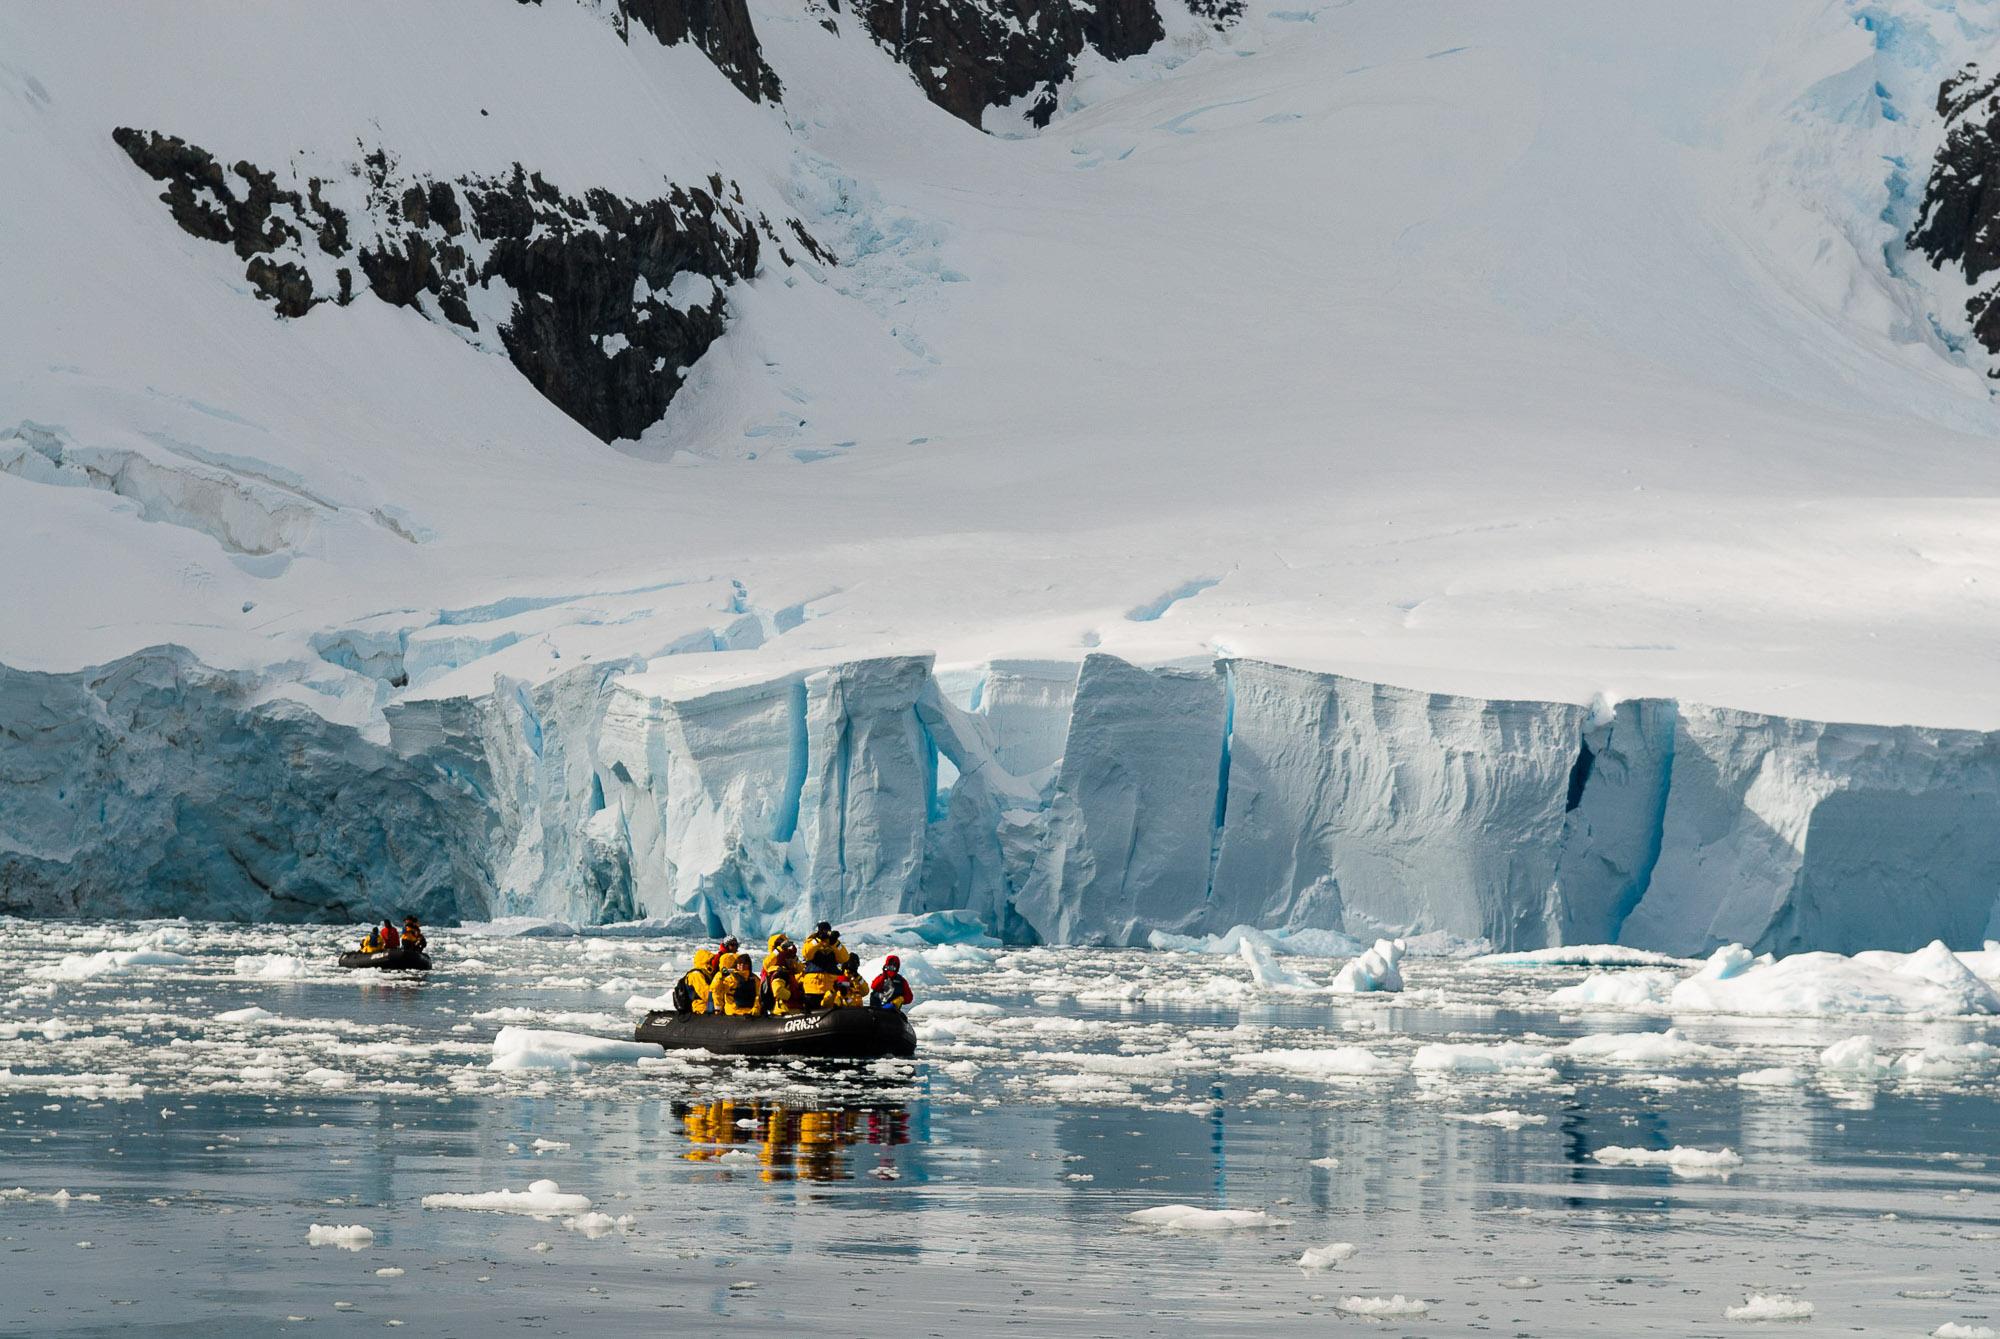 Paradise Harbour, Antarctica. © www.thomaspickard.com